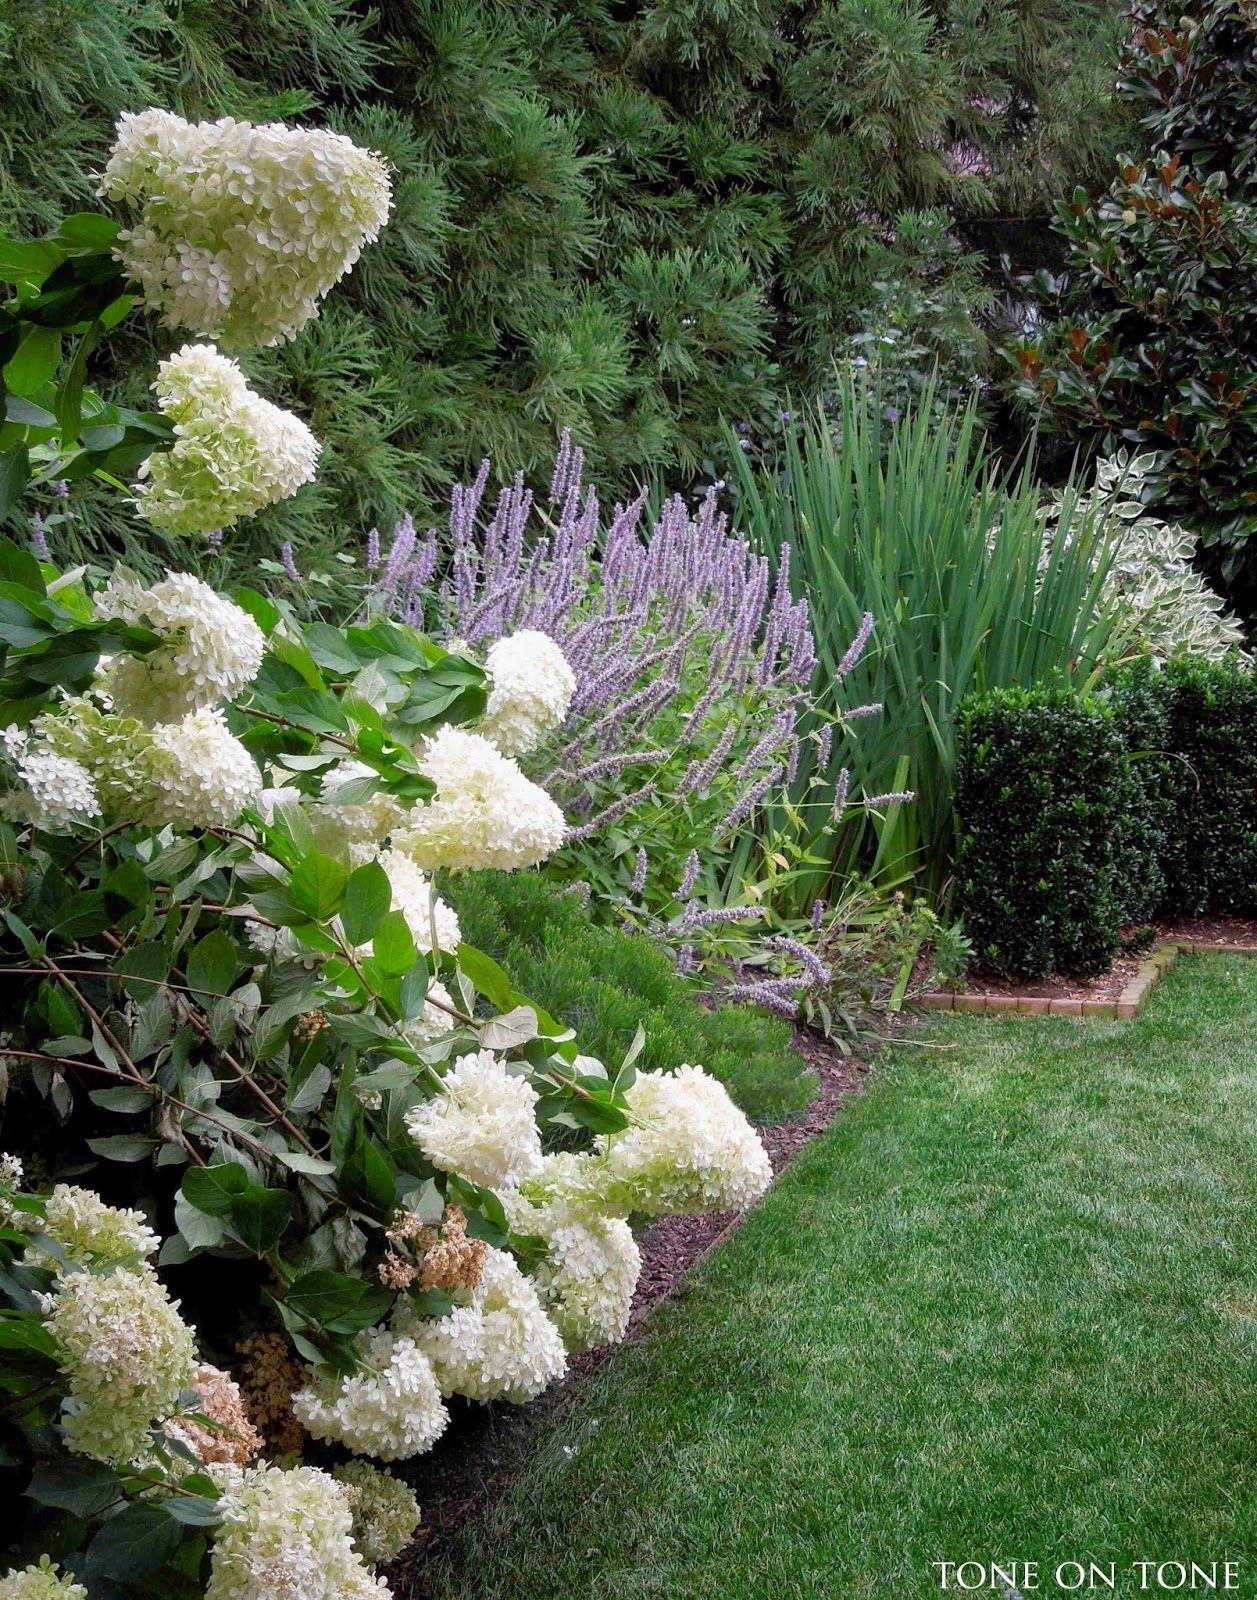 Limelight Hydrangeas To The Right Of The Garden Pavilion Burst Into Bloom Next To The Hydrangeas Is Blue F Beautiful Gardens Hydrangea Garden Gorgeous Gardens